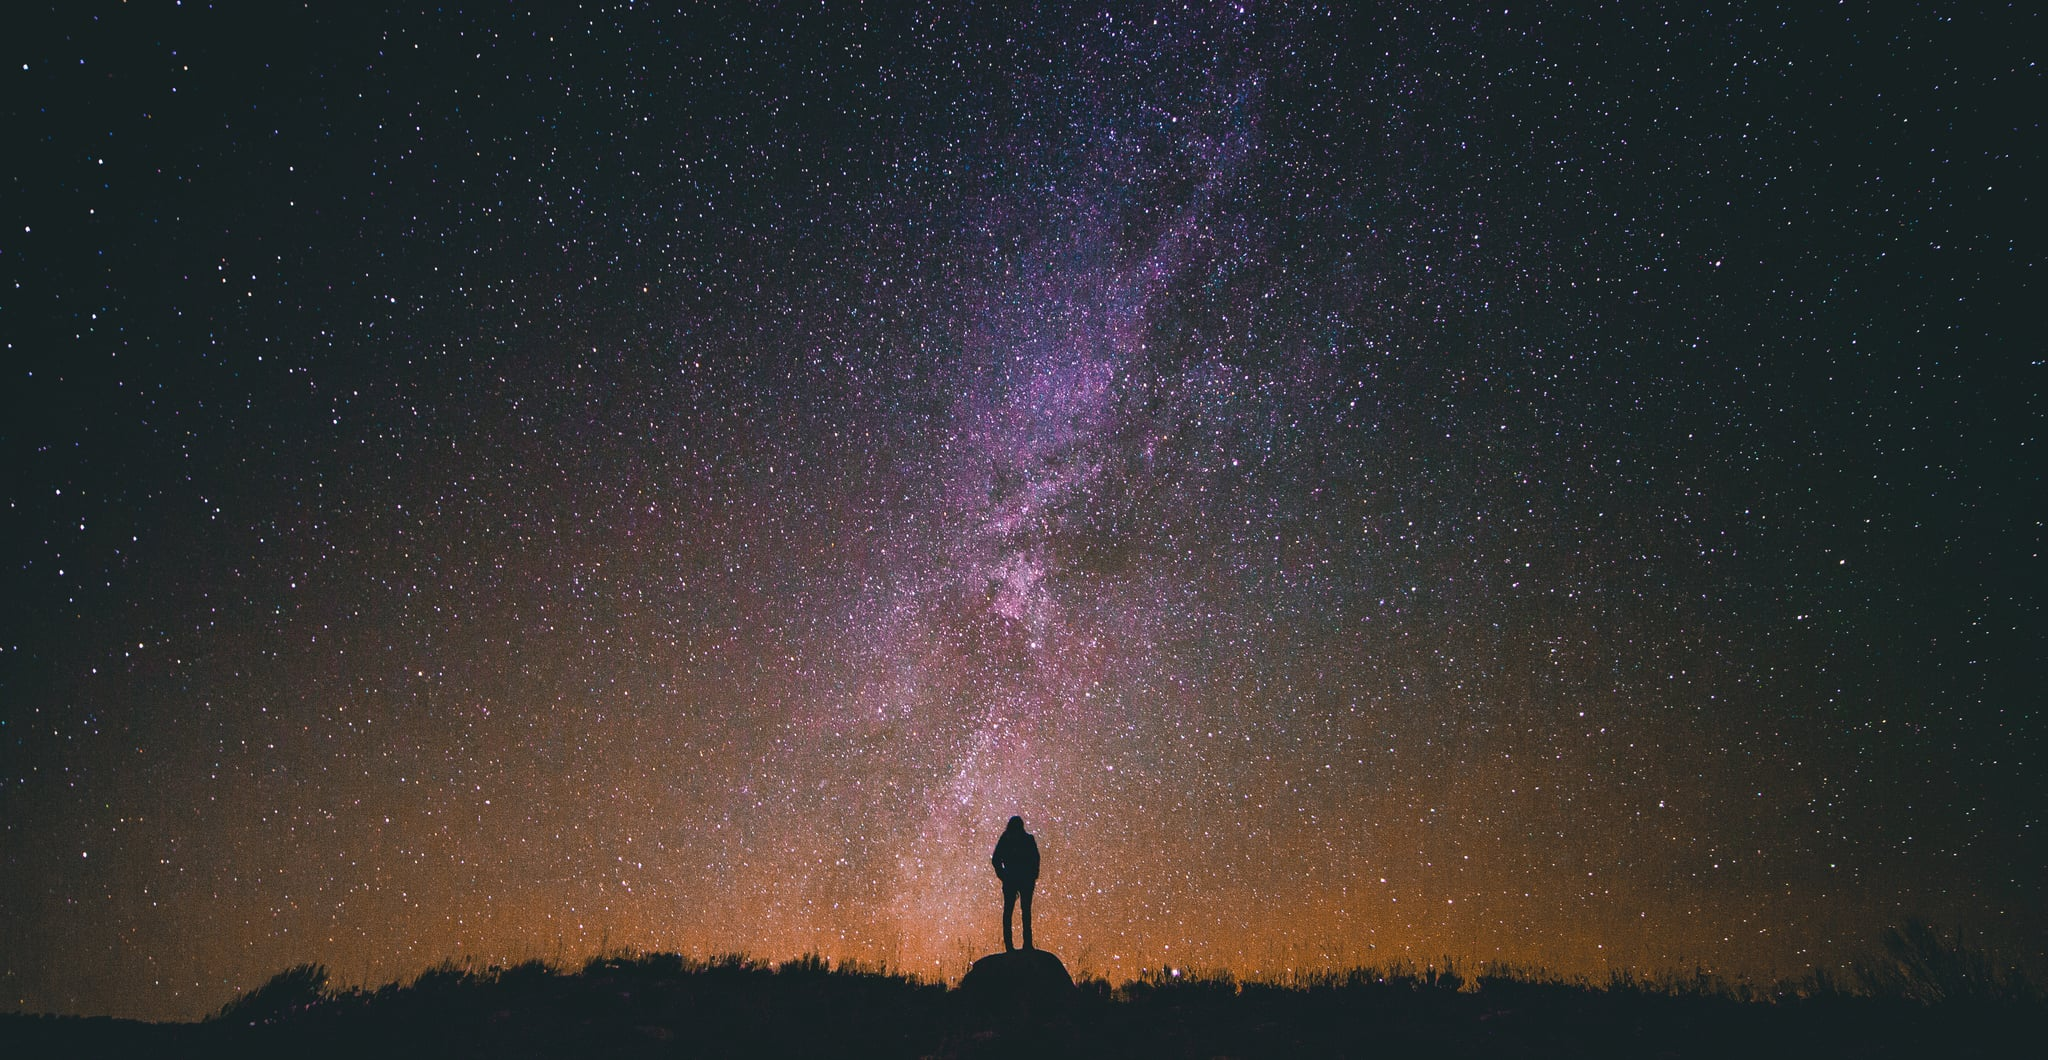 tmp_wsOfF5_c78811faa8bc3bfb_person-sky-silhouette-night-32237.jpg